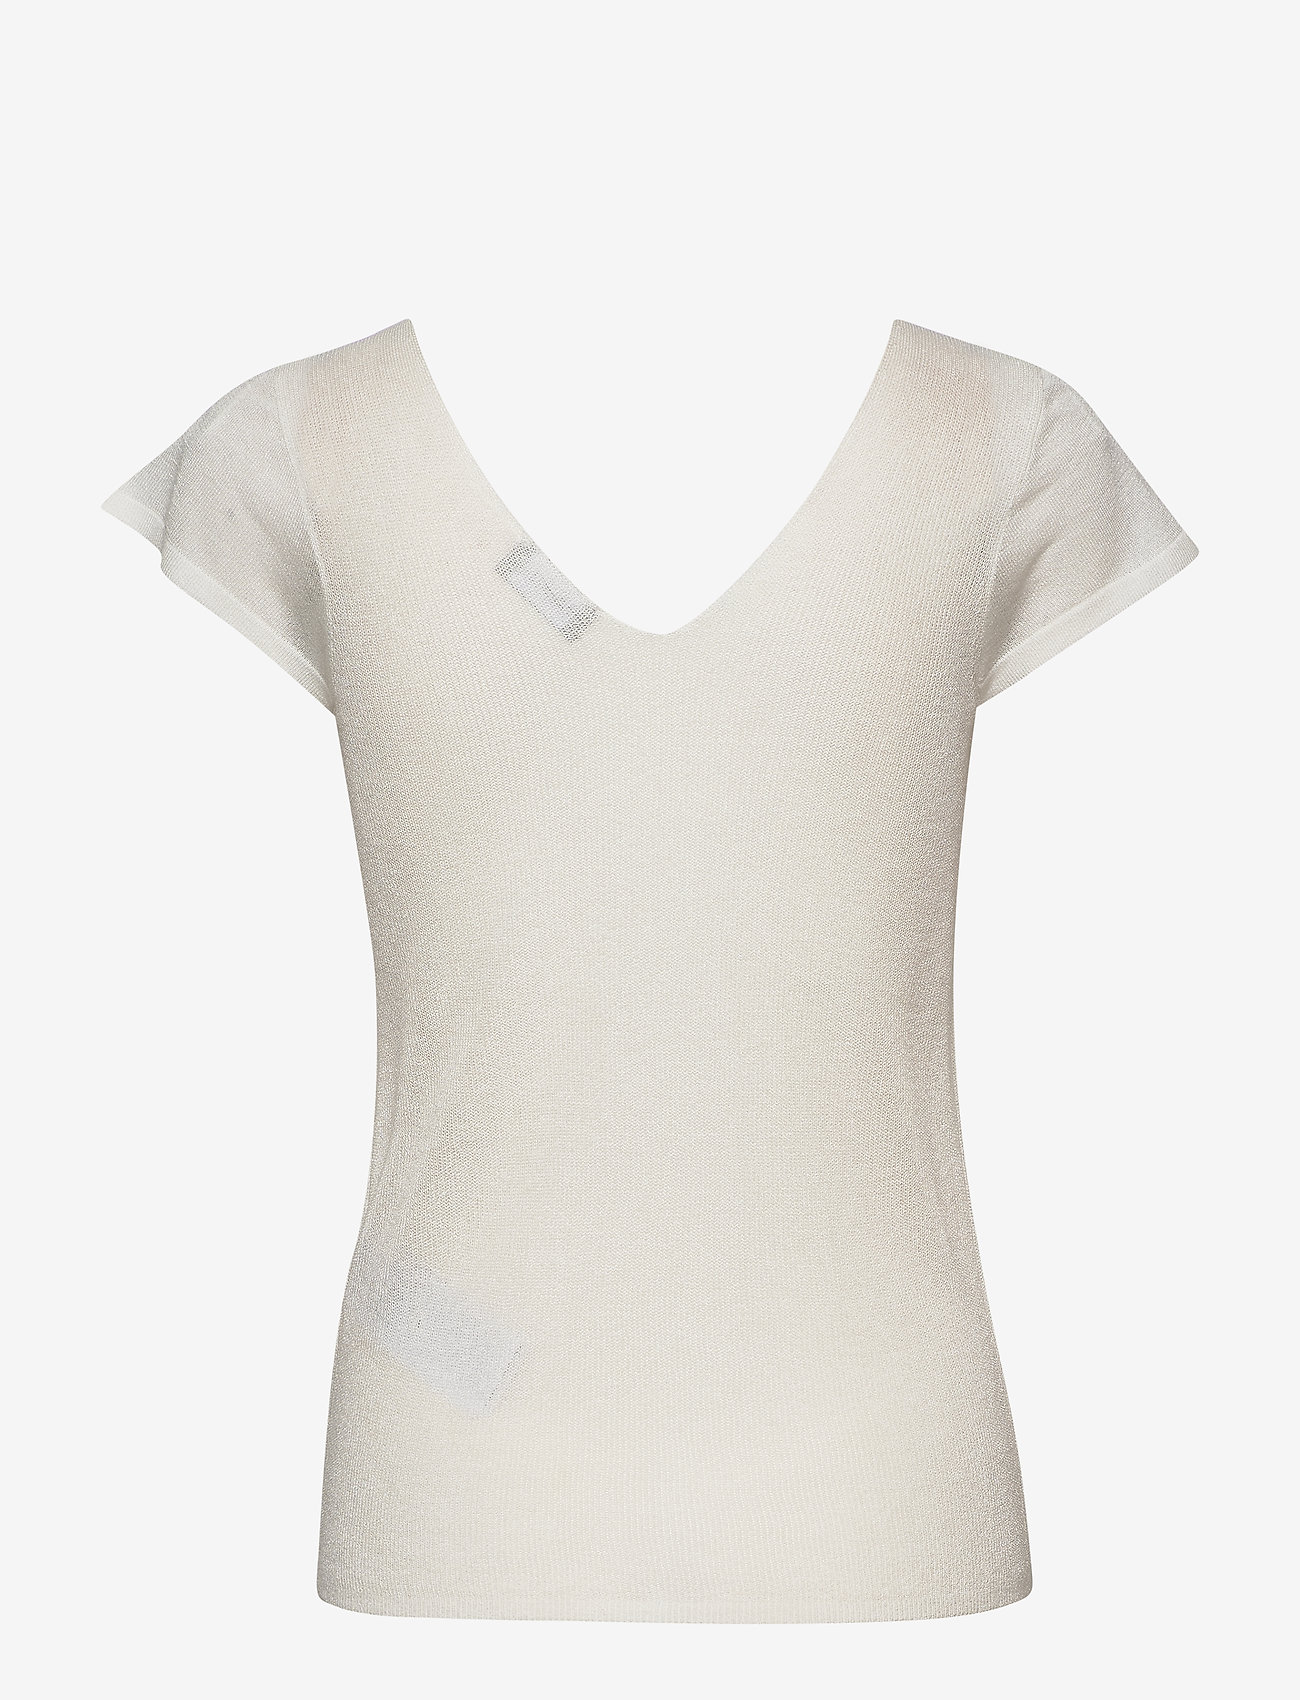 Taifun - TOP KNITWEAR - stickade toppar & t-shirts - offwhite - 1